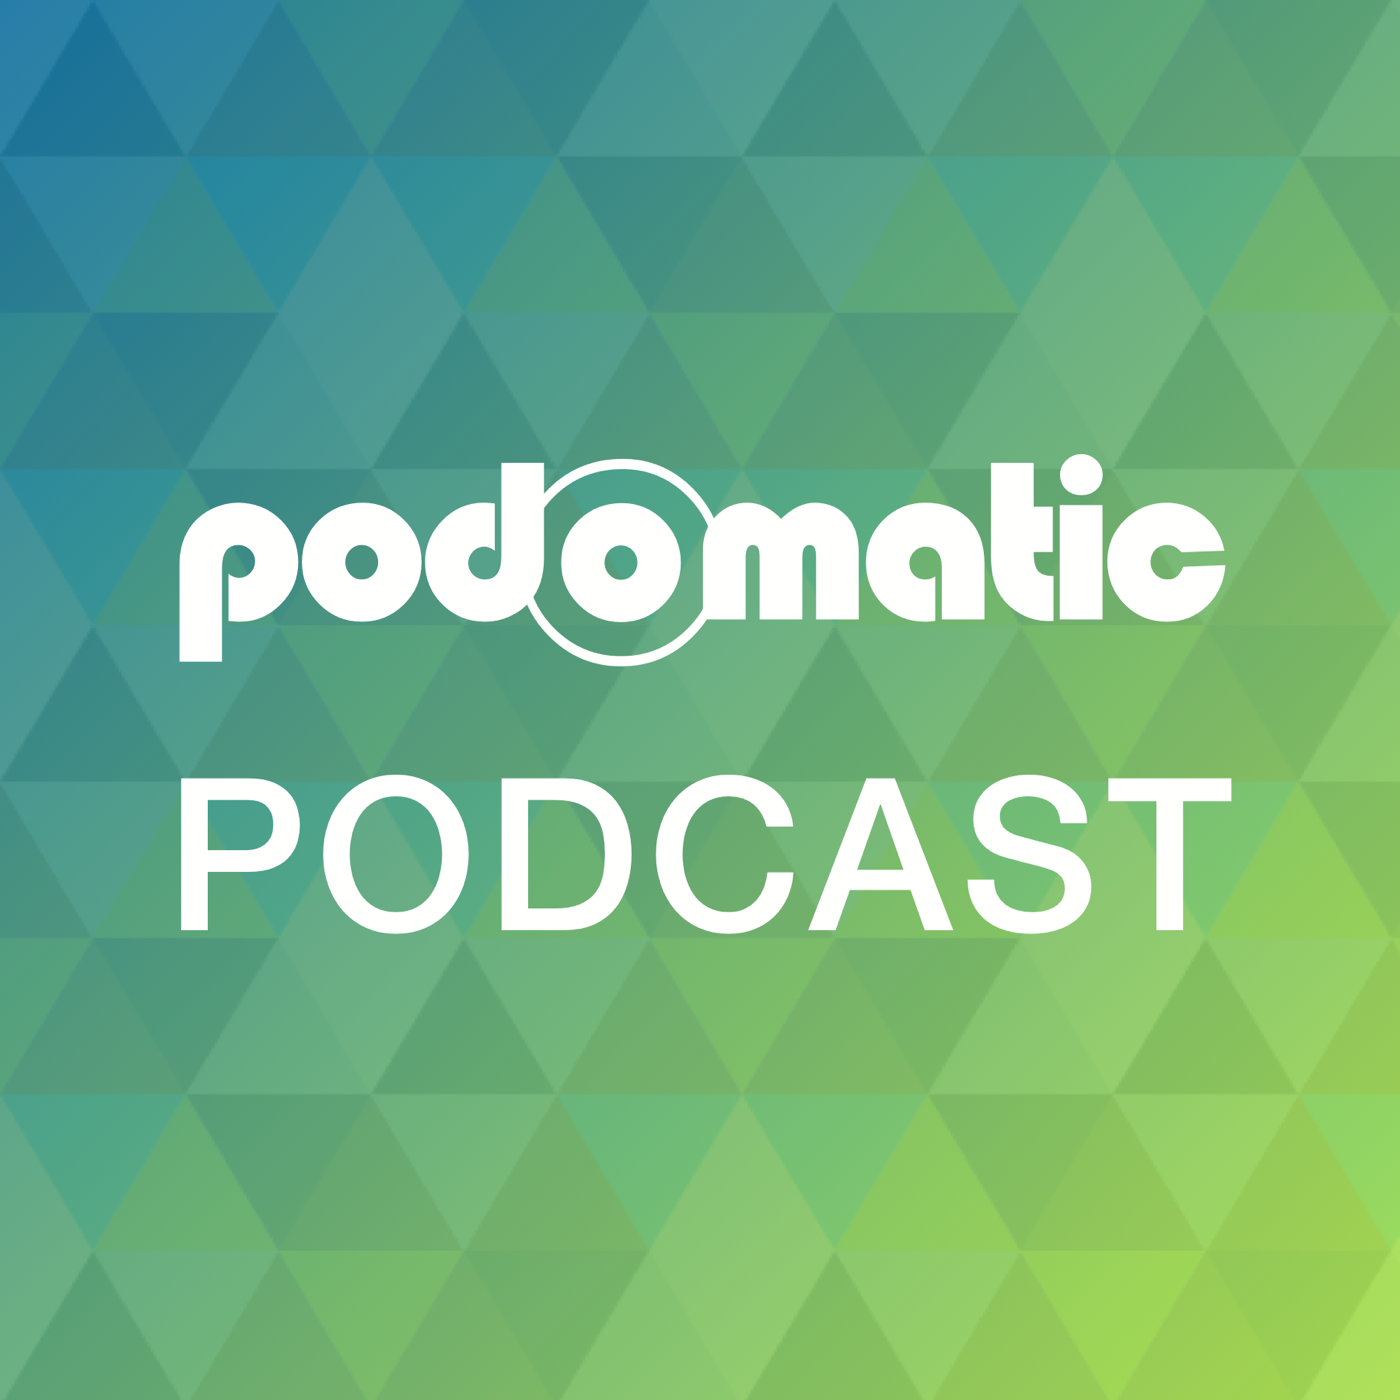 Bobby Oritseseyi Udosen's Podcast